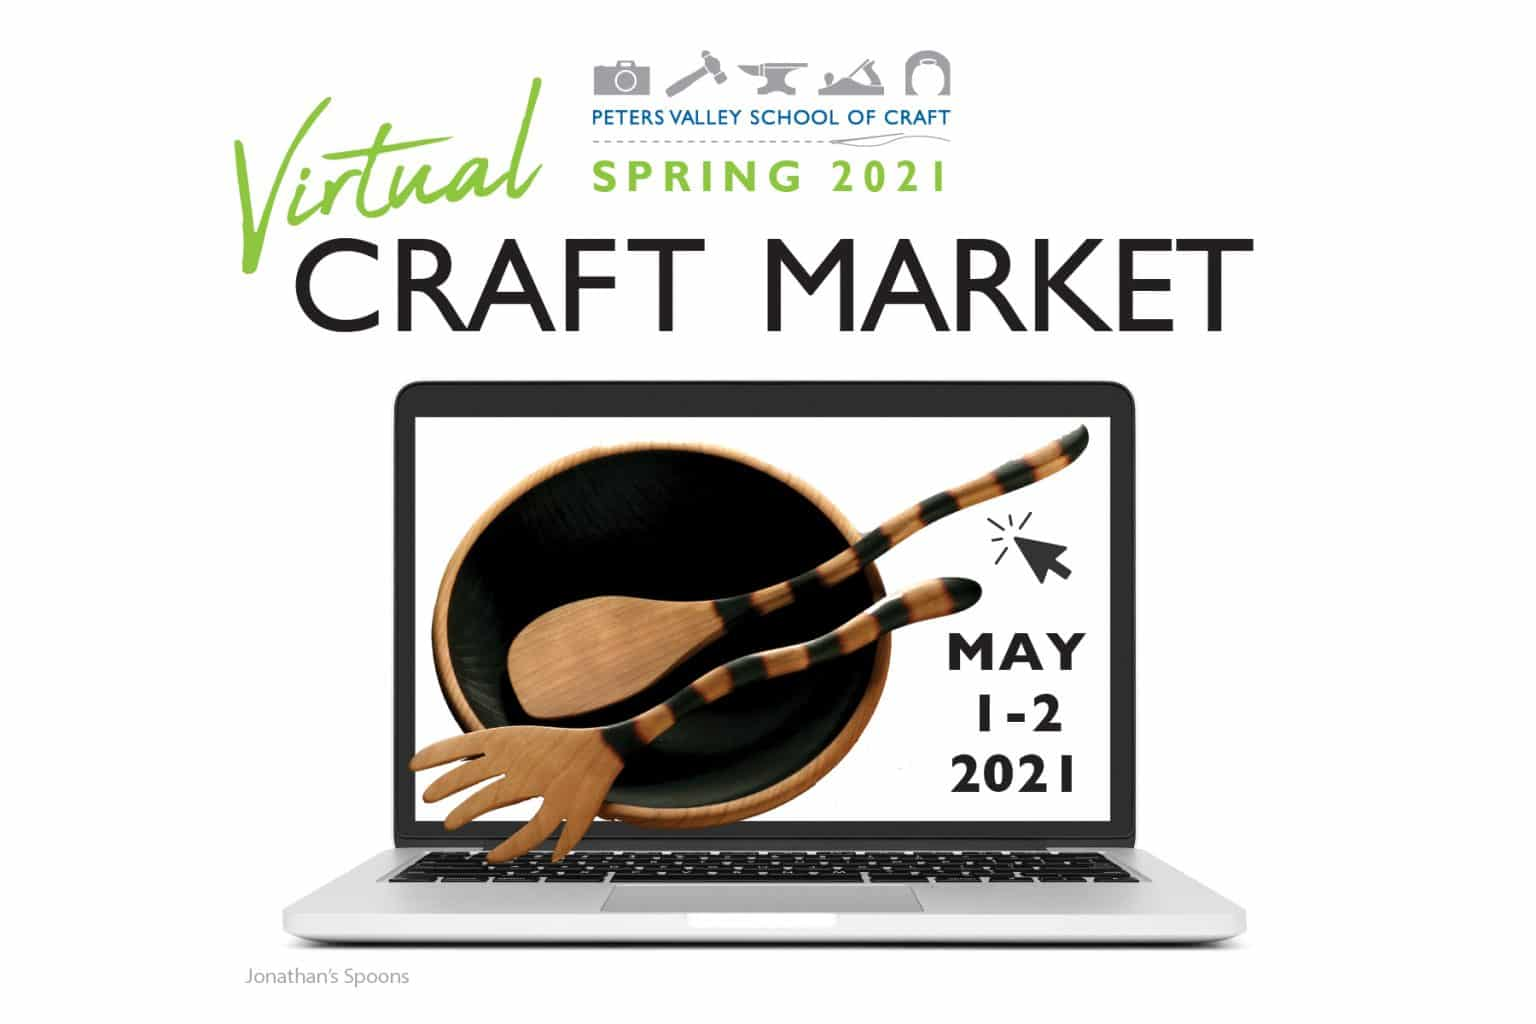 Virtual Craft Market Announcement